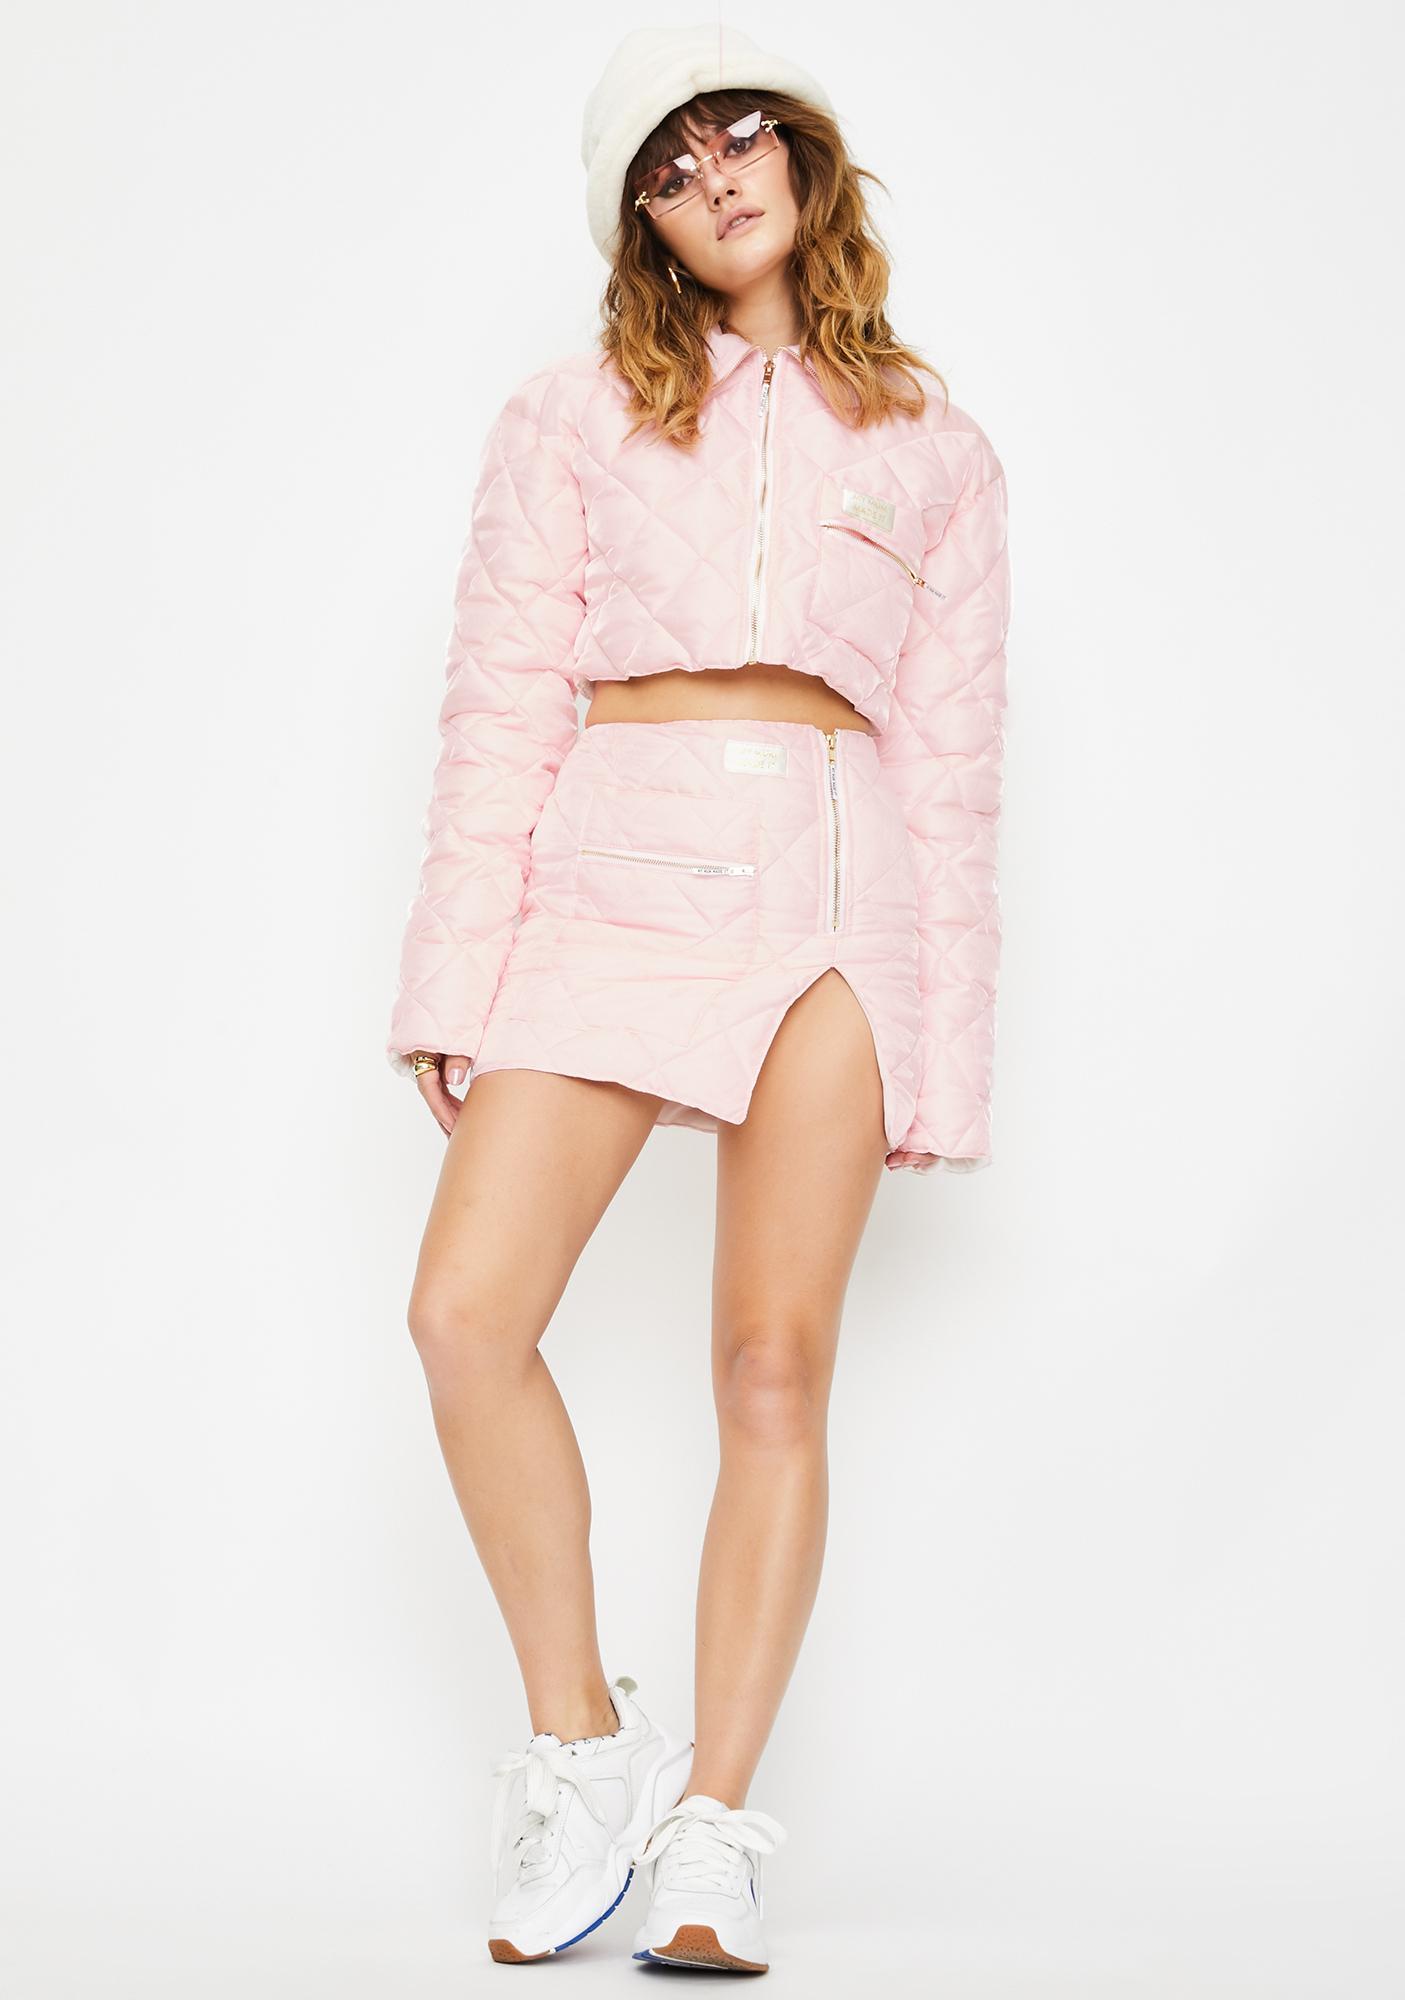 My Mum Made It Quilted Organza Puffer Skirt